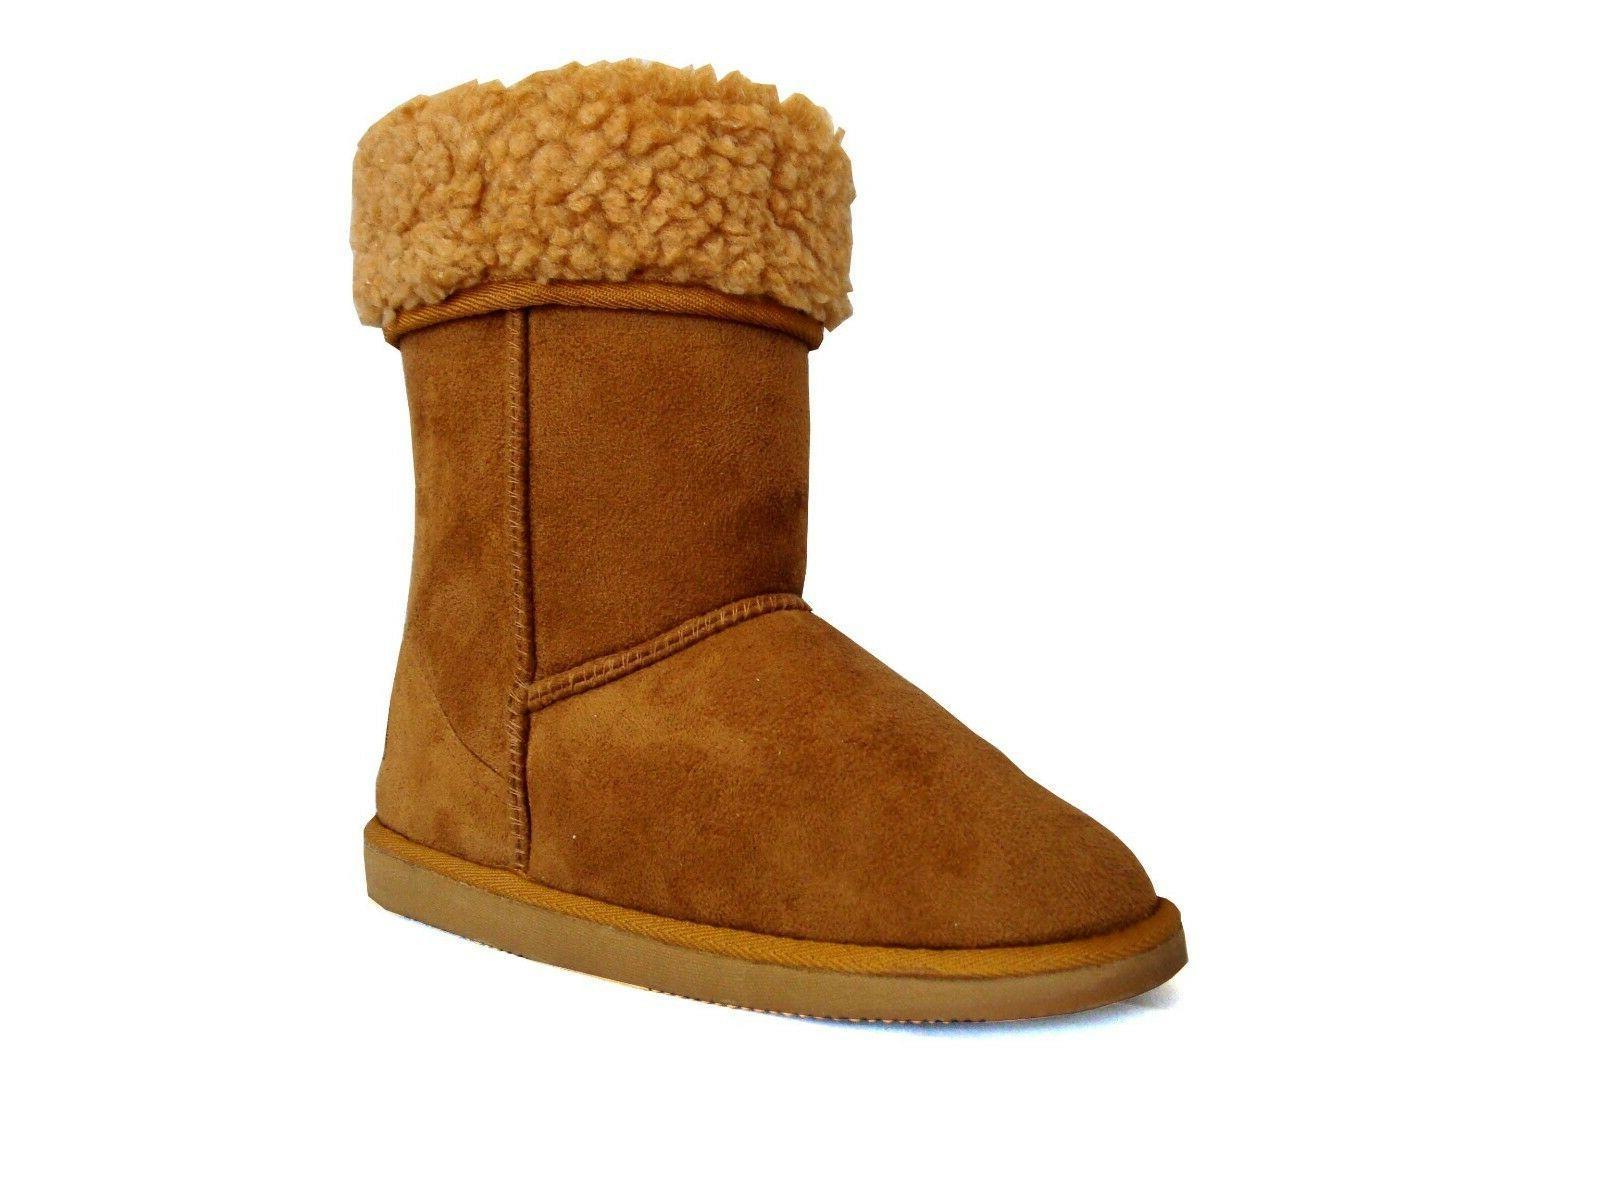 NEW Classic Snow Boots Heel Faux Fur -430